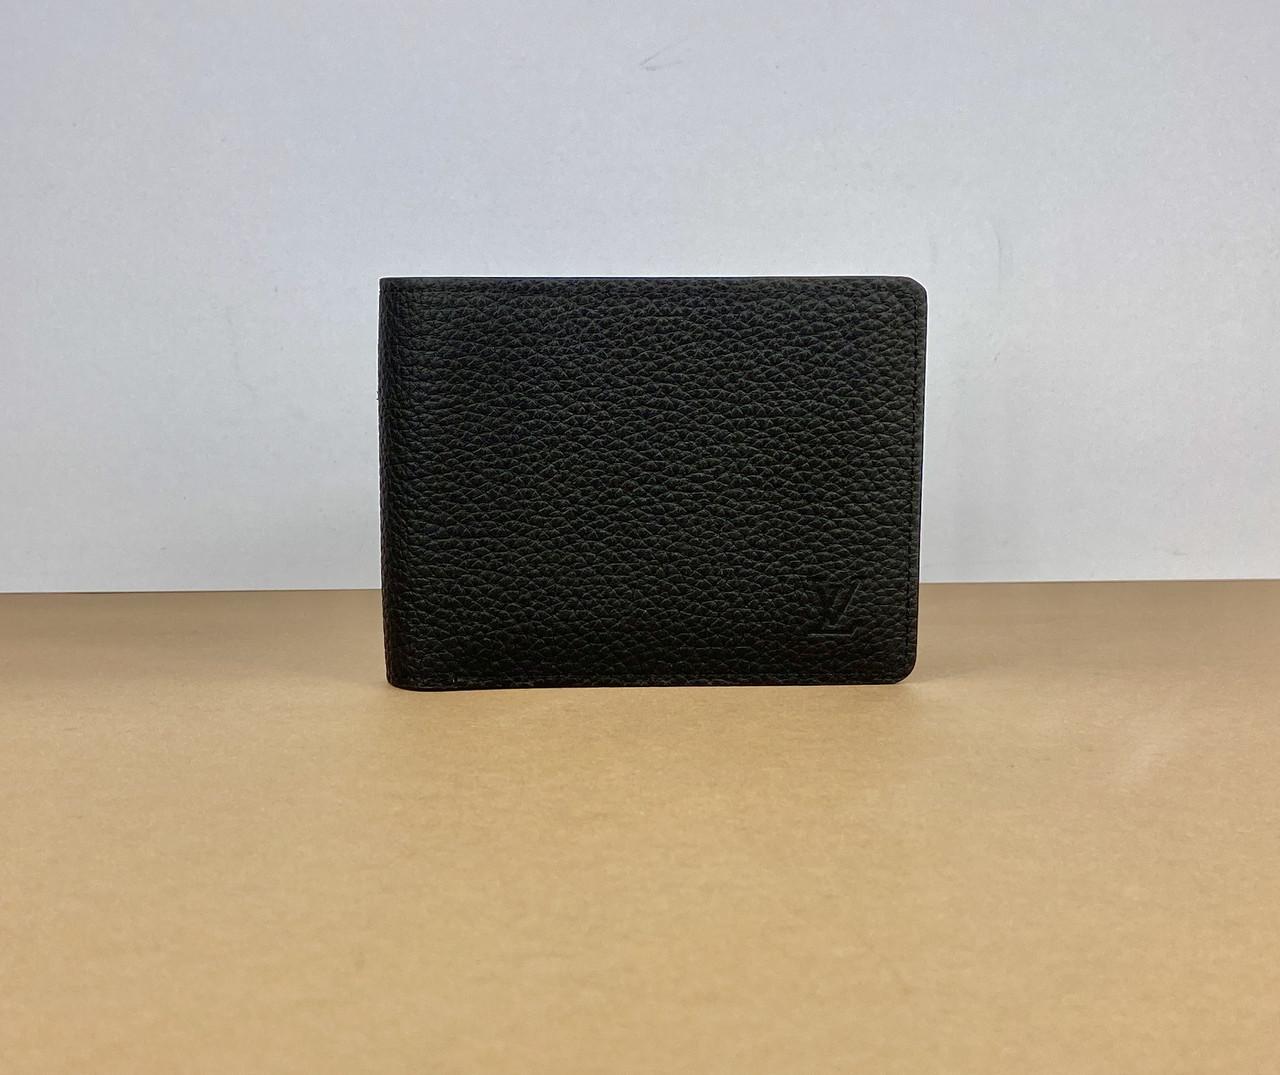 Бумажник Multiple Louis Vuitton (Луи Виттон) арт. 32-20